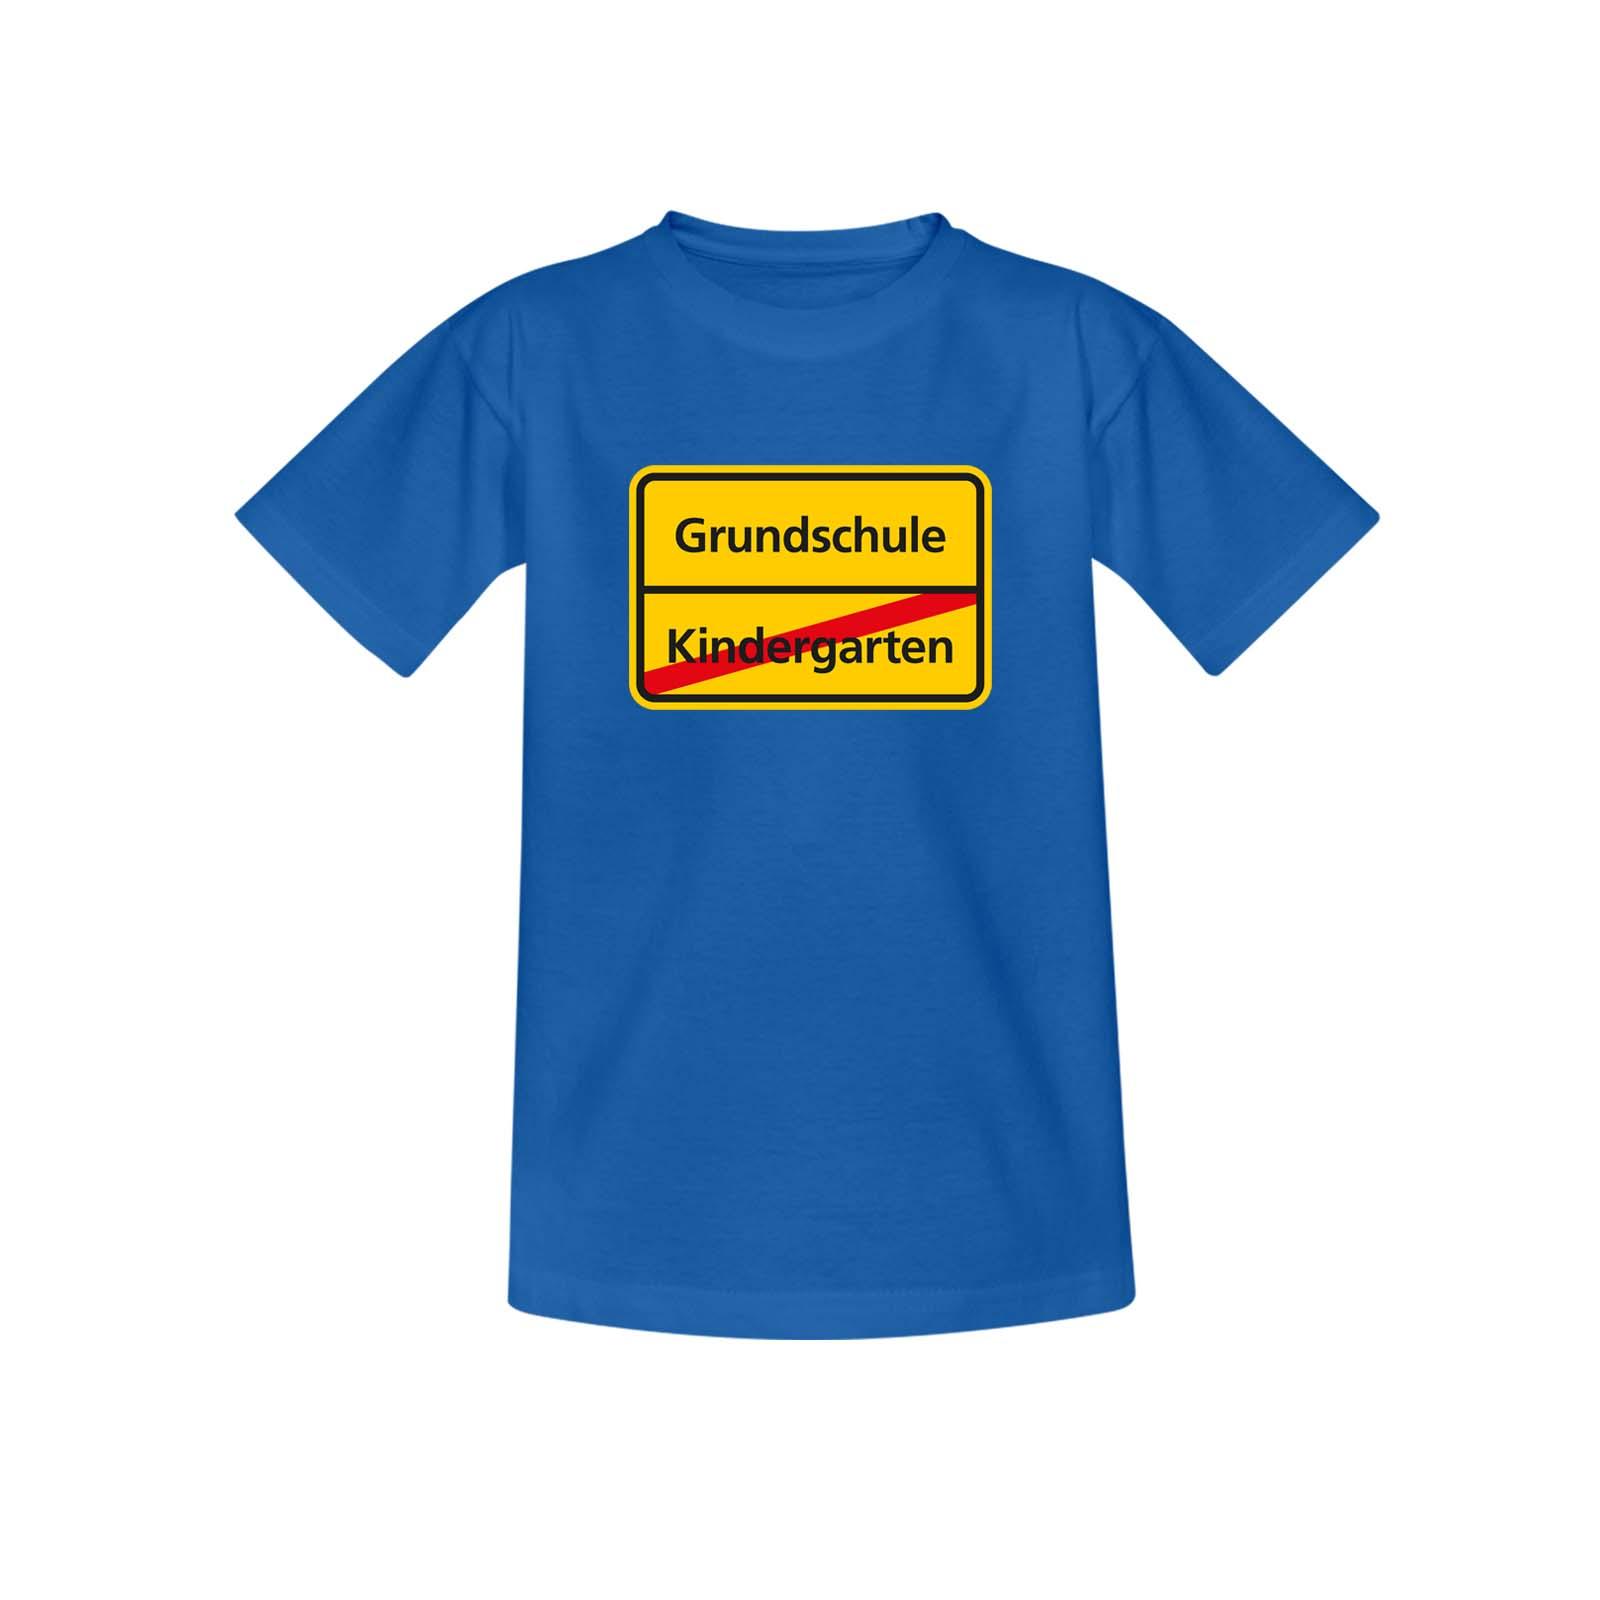 Klasse 10 Farben Kinder 98-164 T-Shirt Kindergarten//Grundschule Einschulung 1